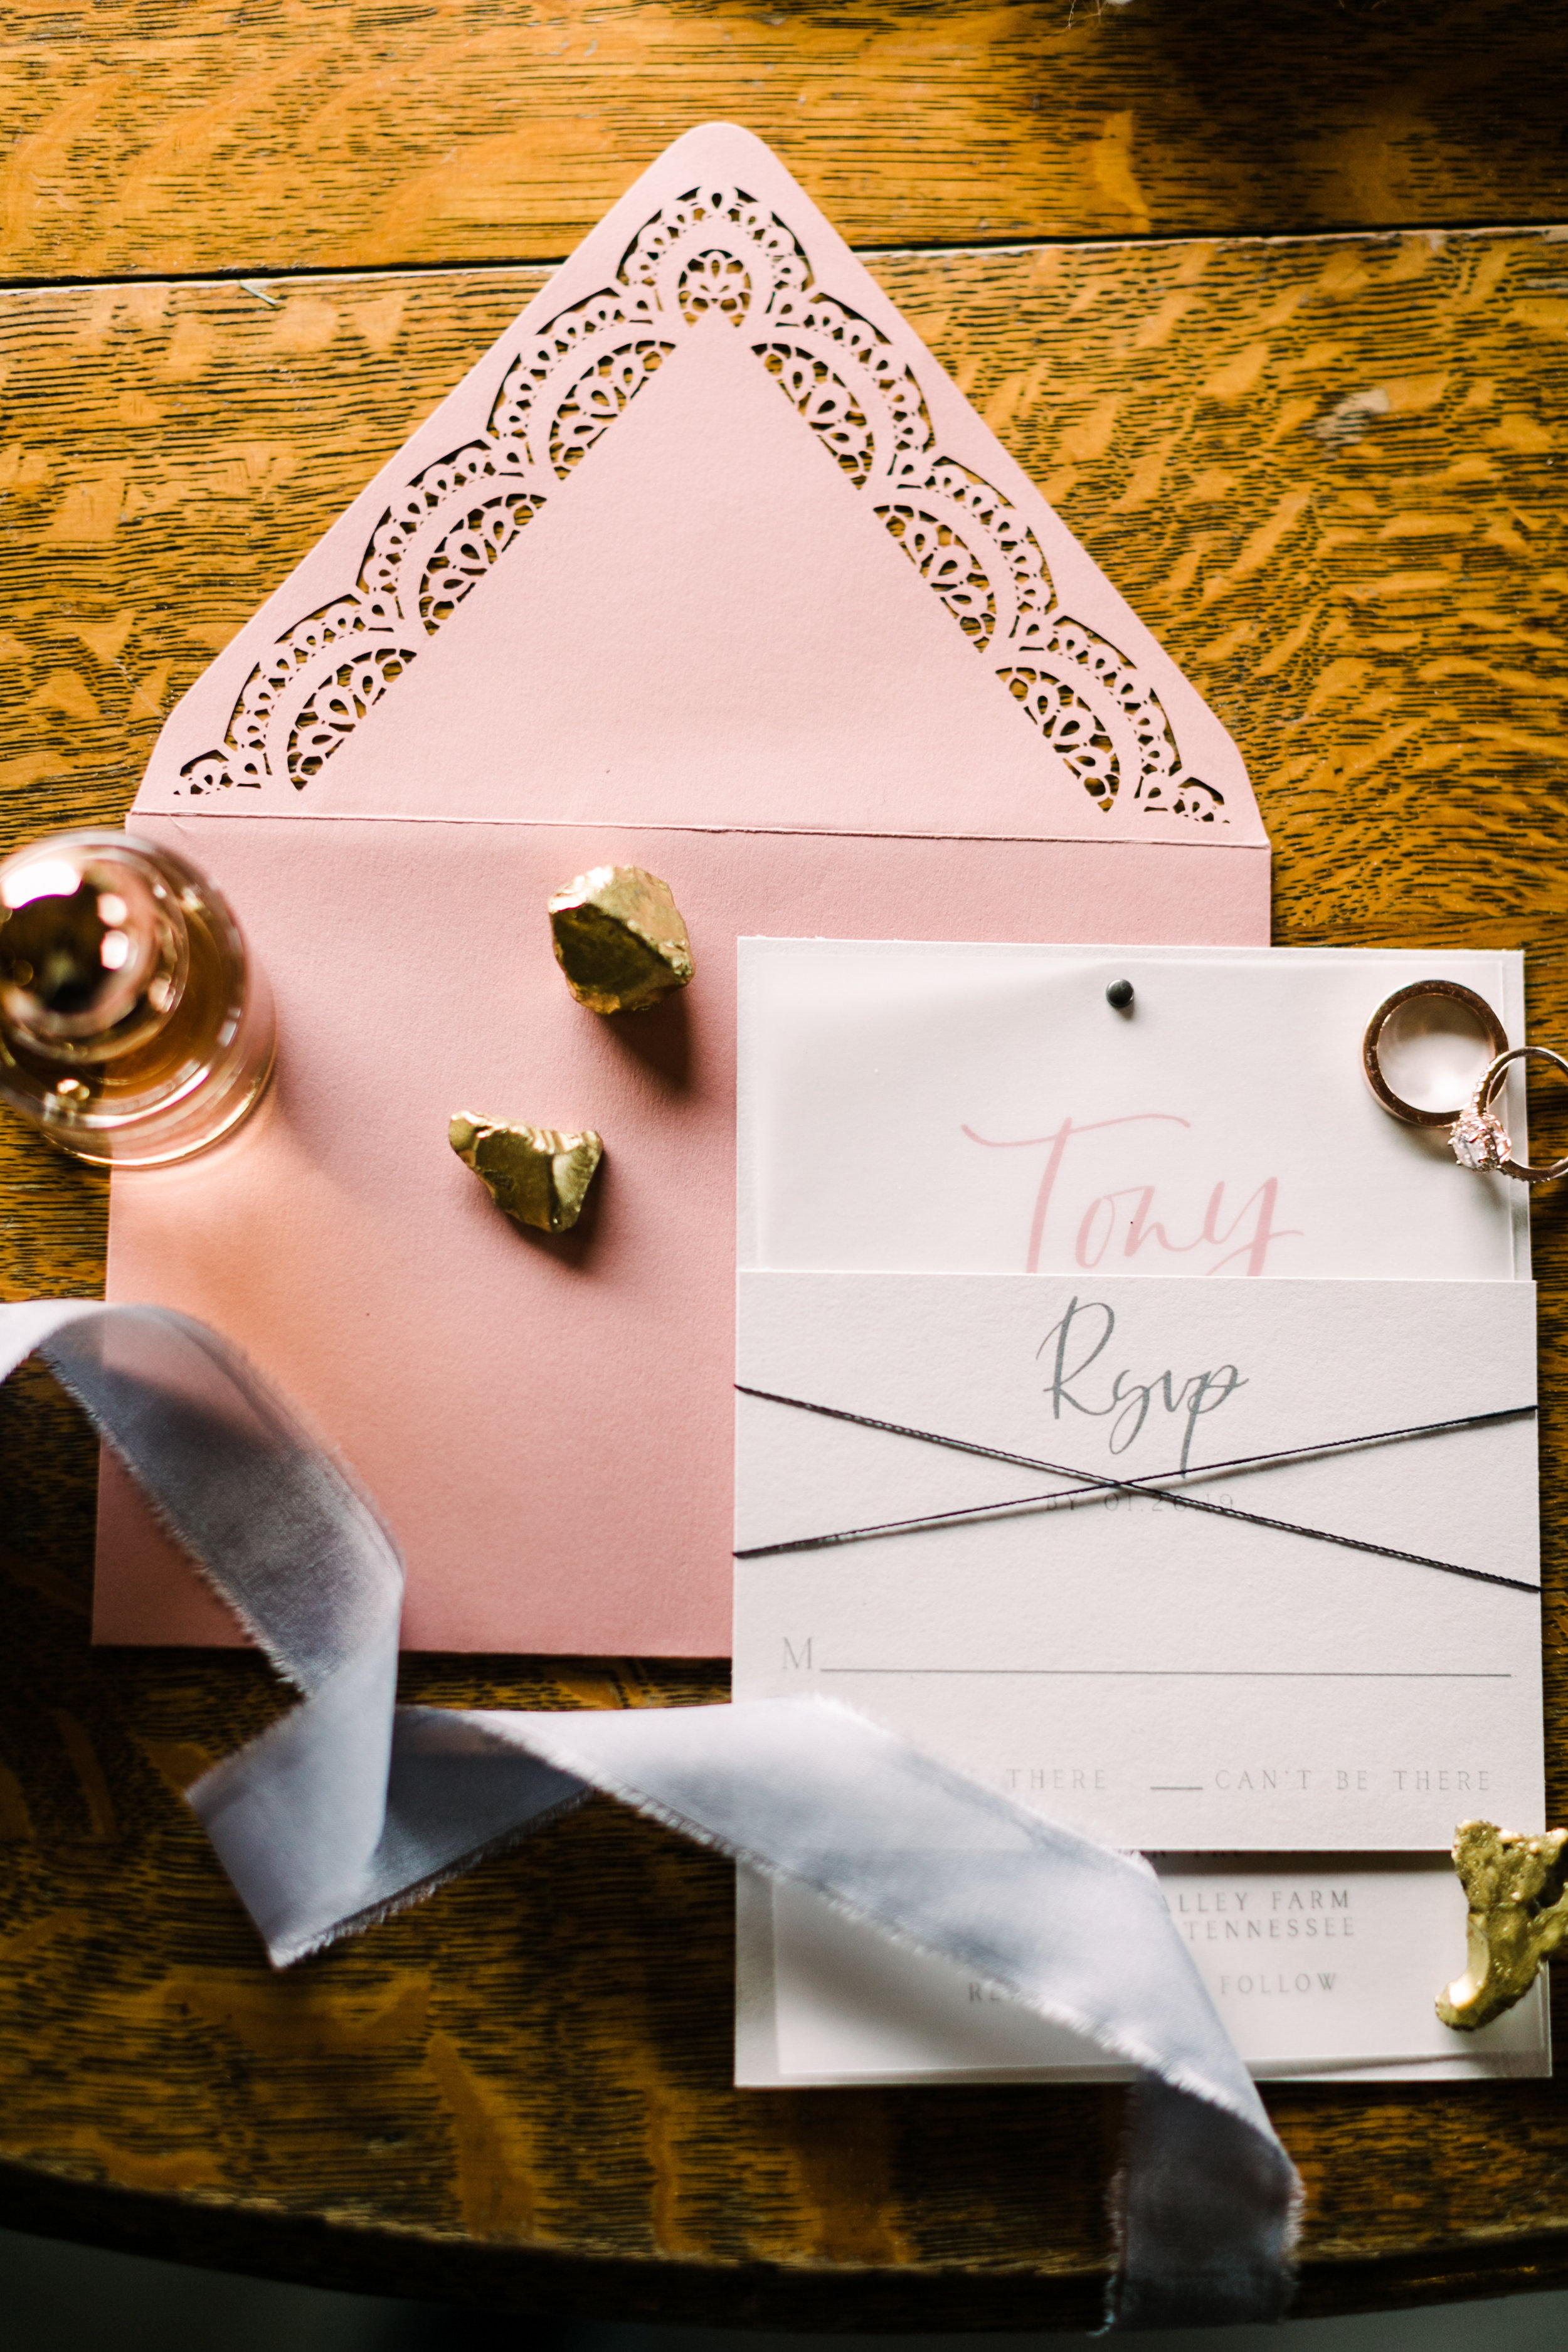 romantic+valentines+day+wedding (17 of 21).jpg